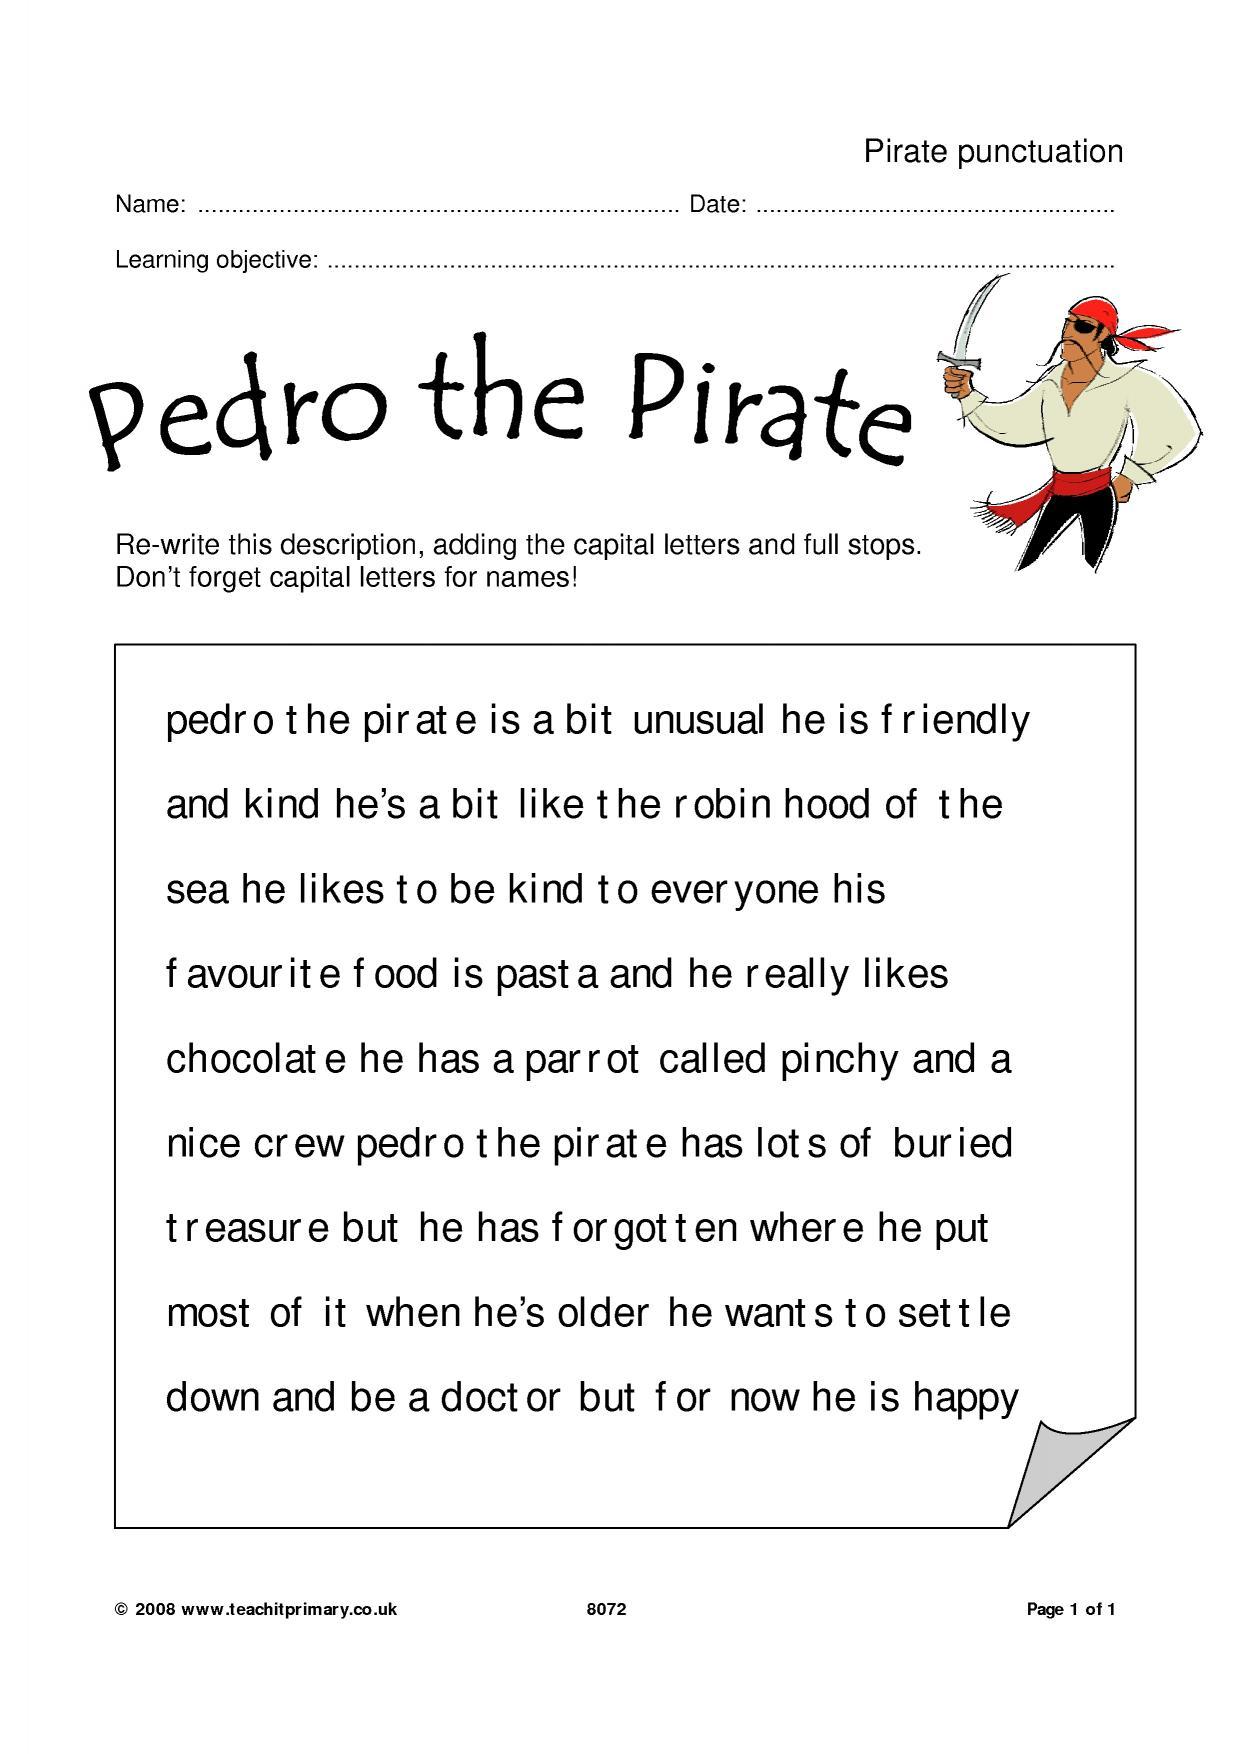 pirate punctuation simple sentences home page. Black Bedroom Furniture Sets. Home Design Ideas